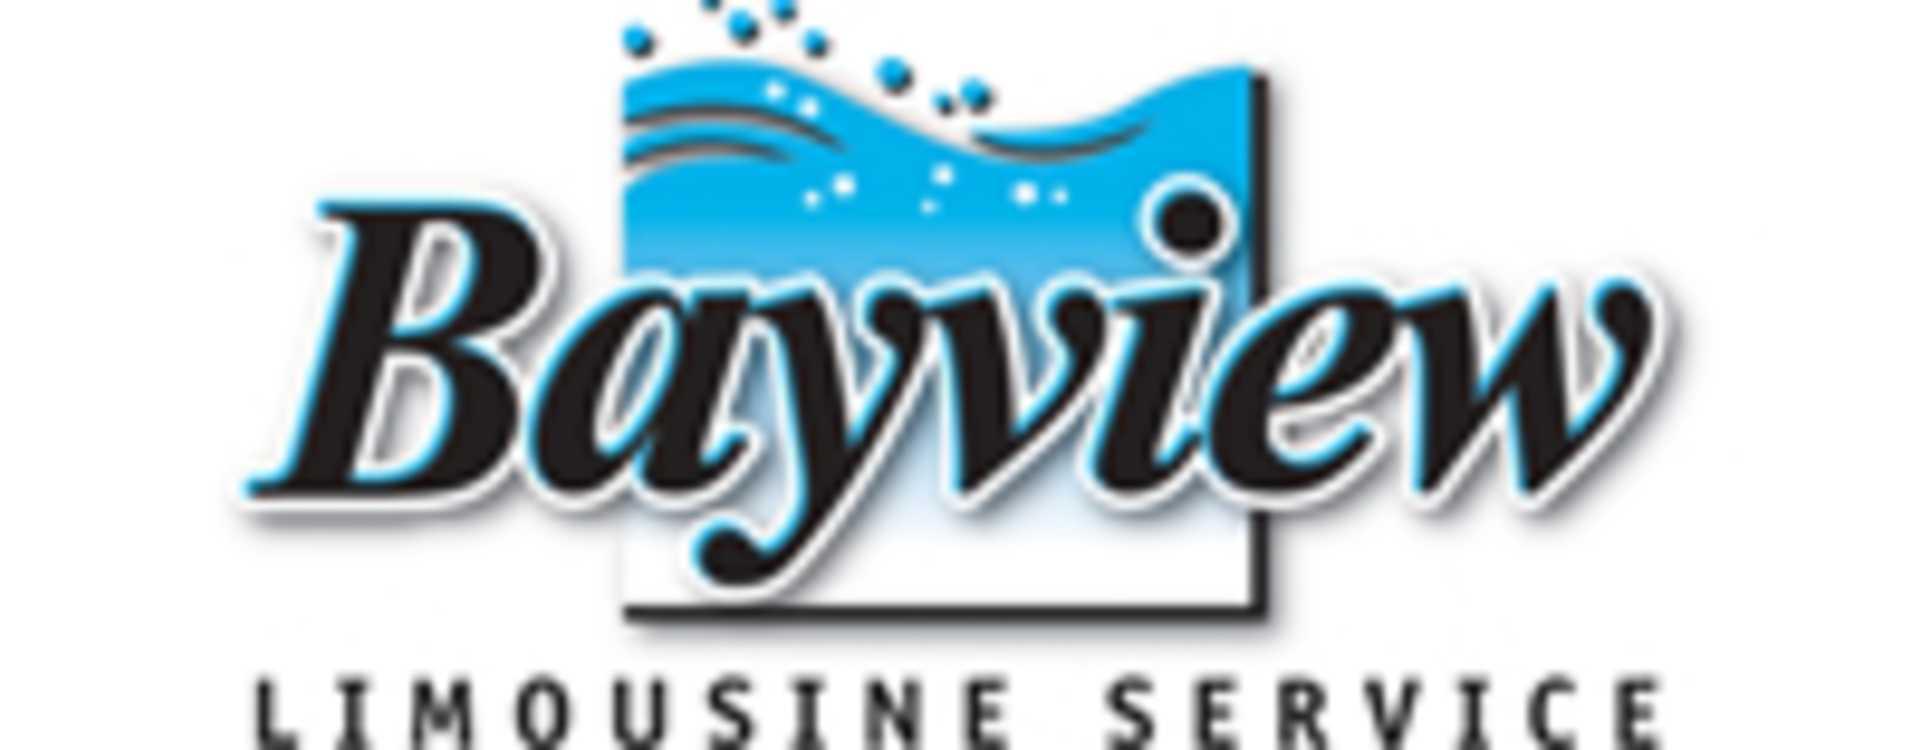 Bayview_Limousine_Services__Inc..jpg